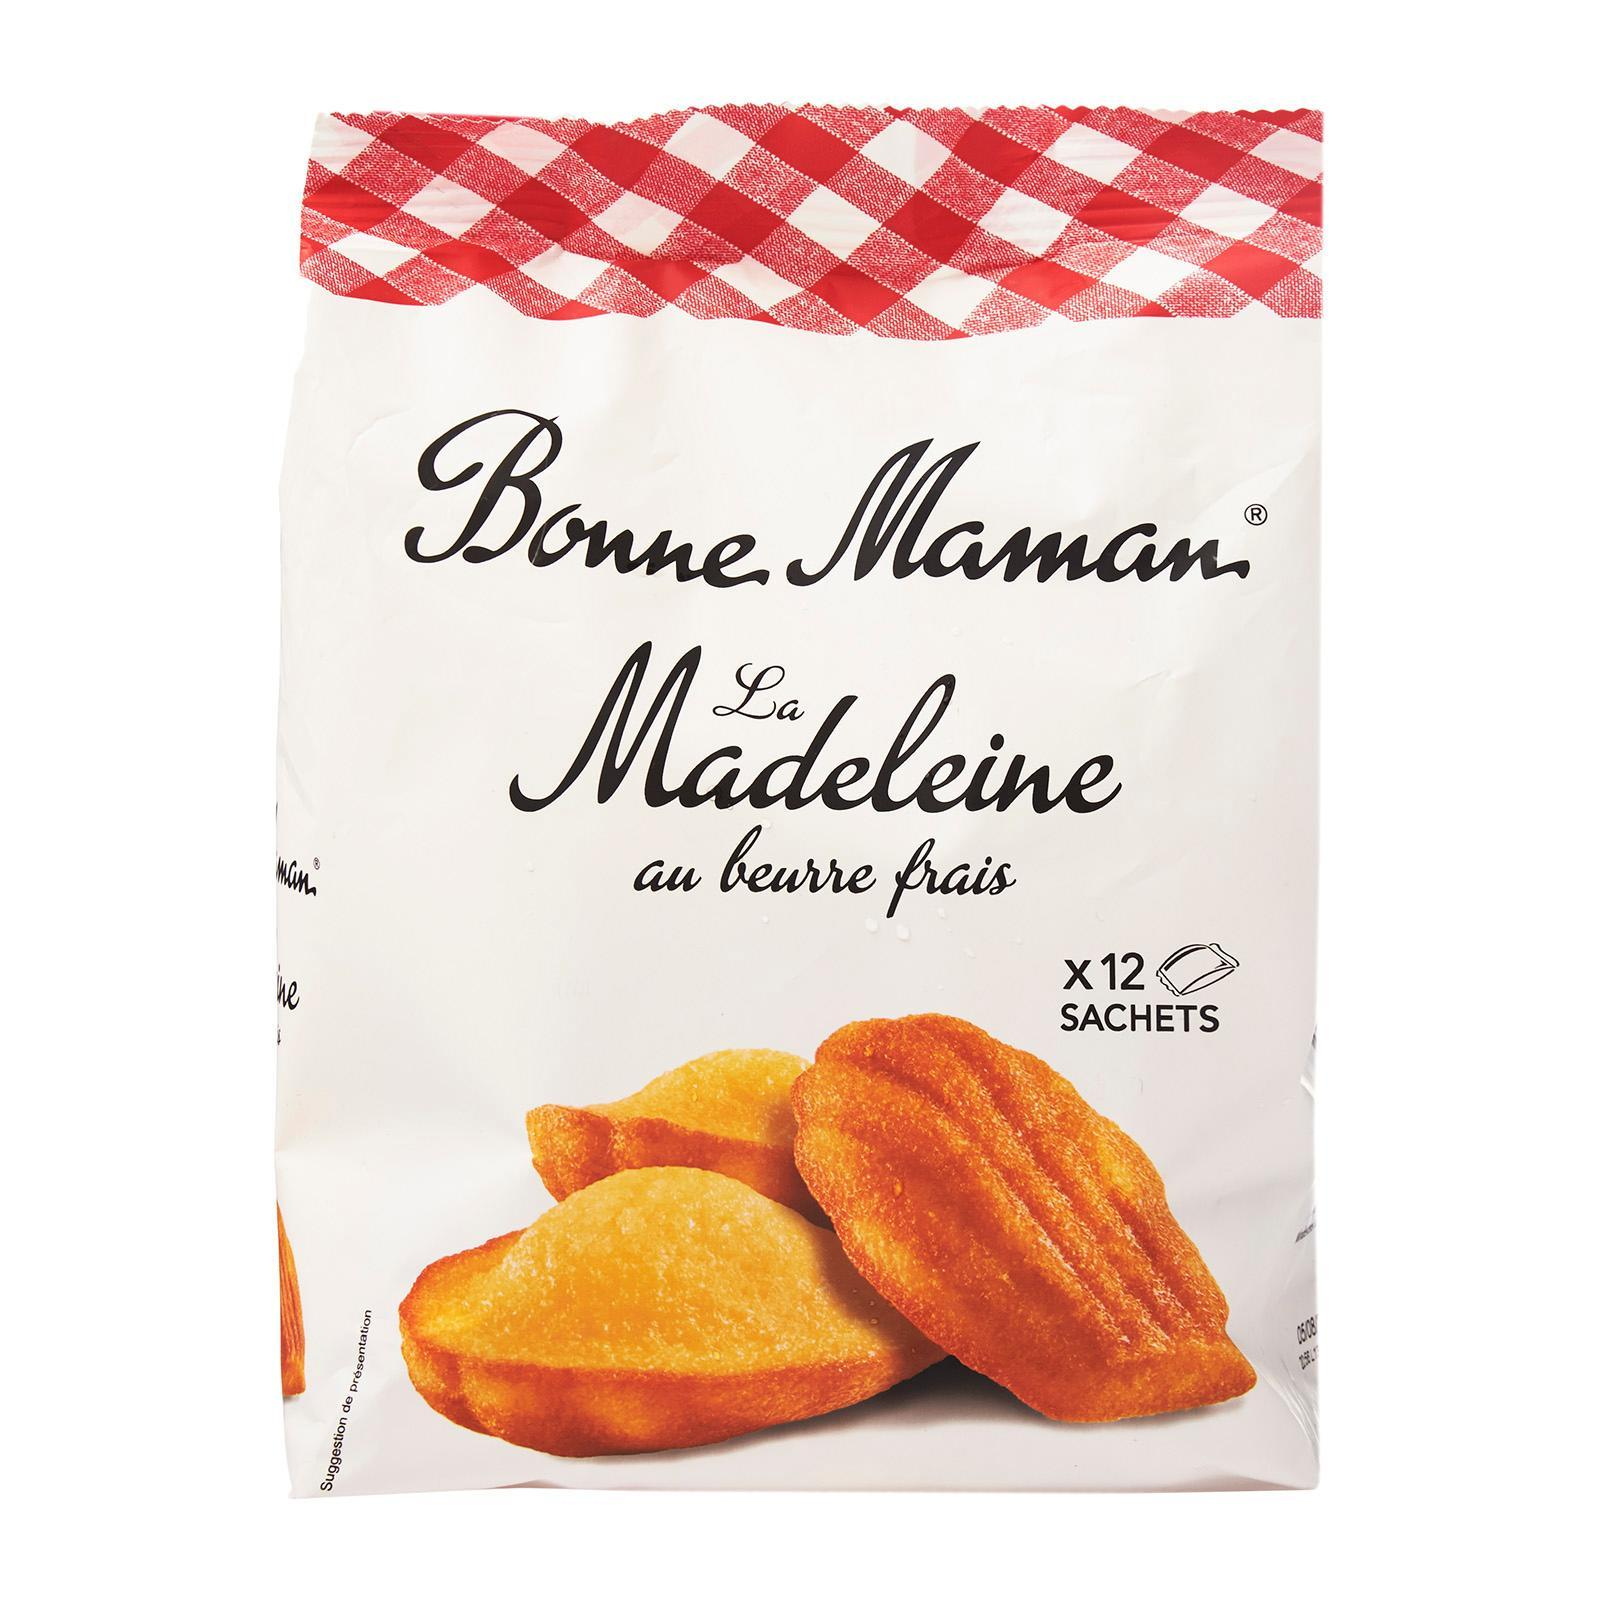 Bonne Maman Original Madeleines By Redmart.